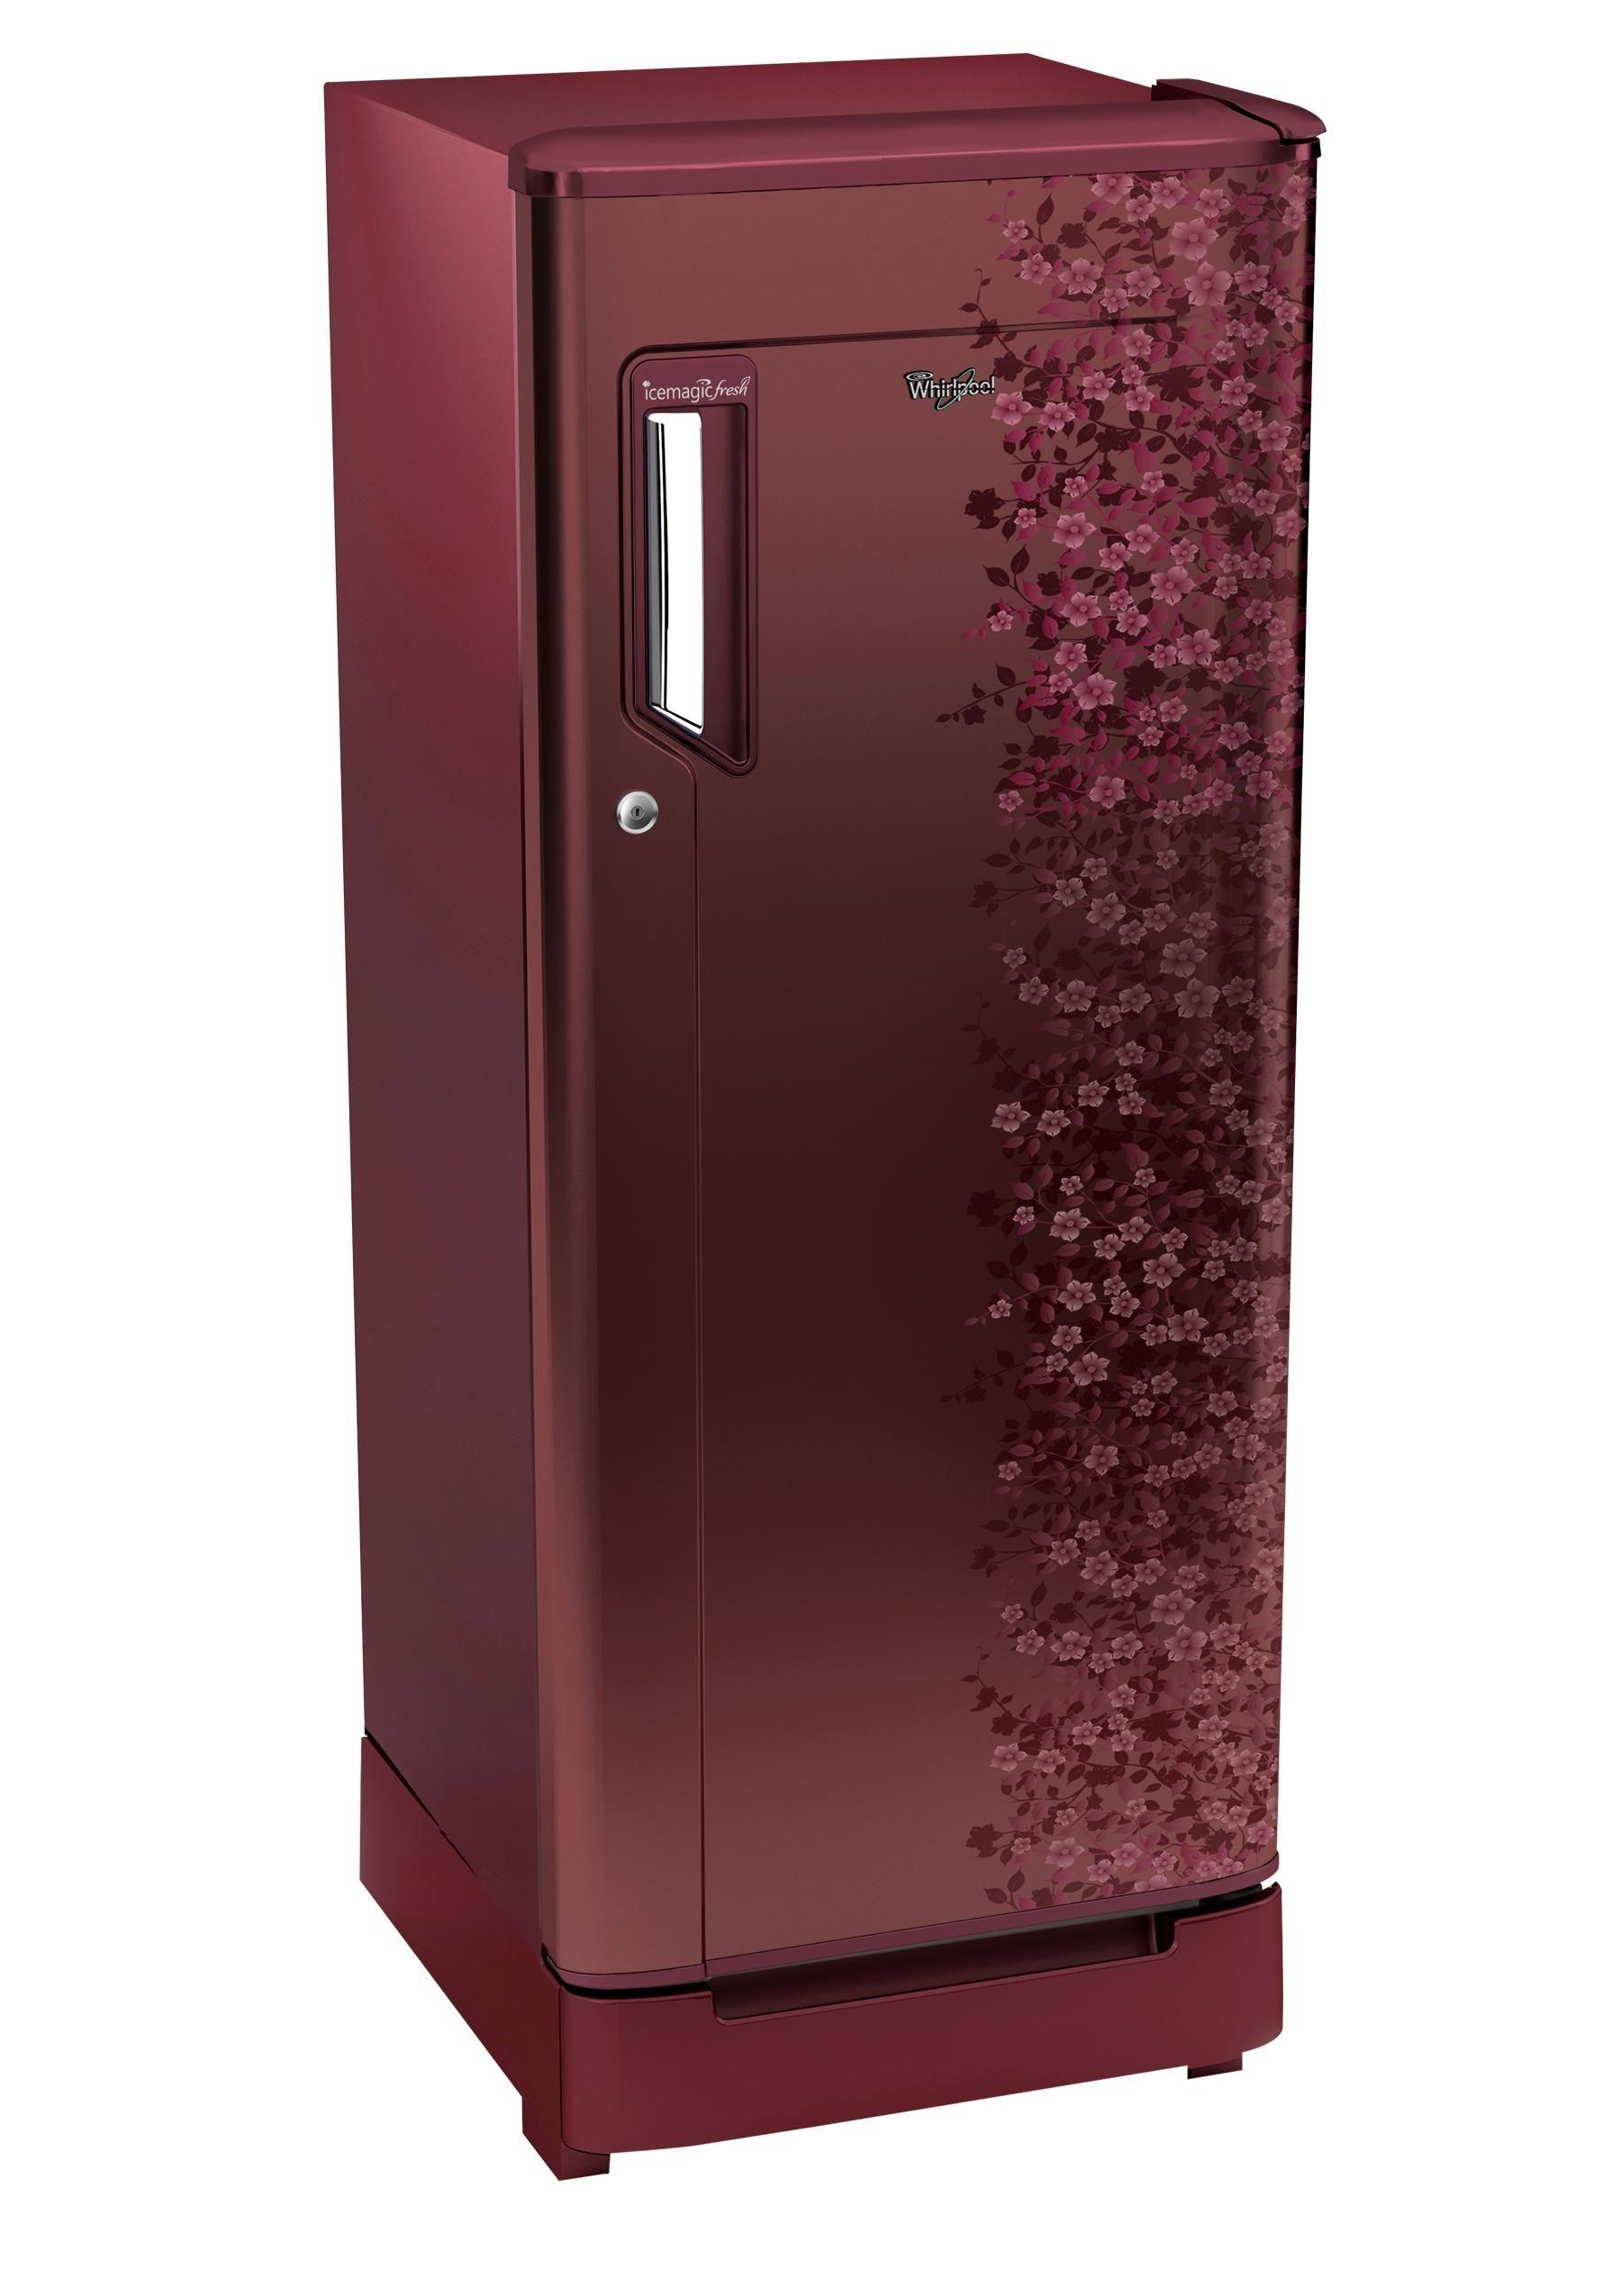 Buy Whirlpool Single Door Refrigerator Online Mumbai Buy Whirlpool Products Like Single Whirlpool Appliance Whirlpool Washing Machine Whirlpool Refrigerator